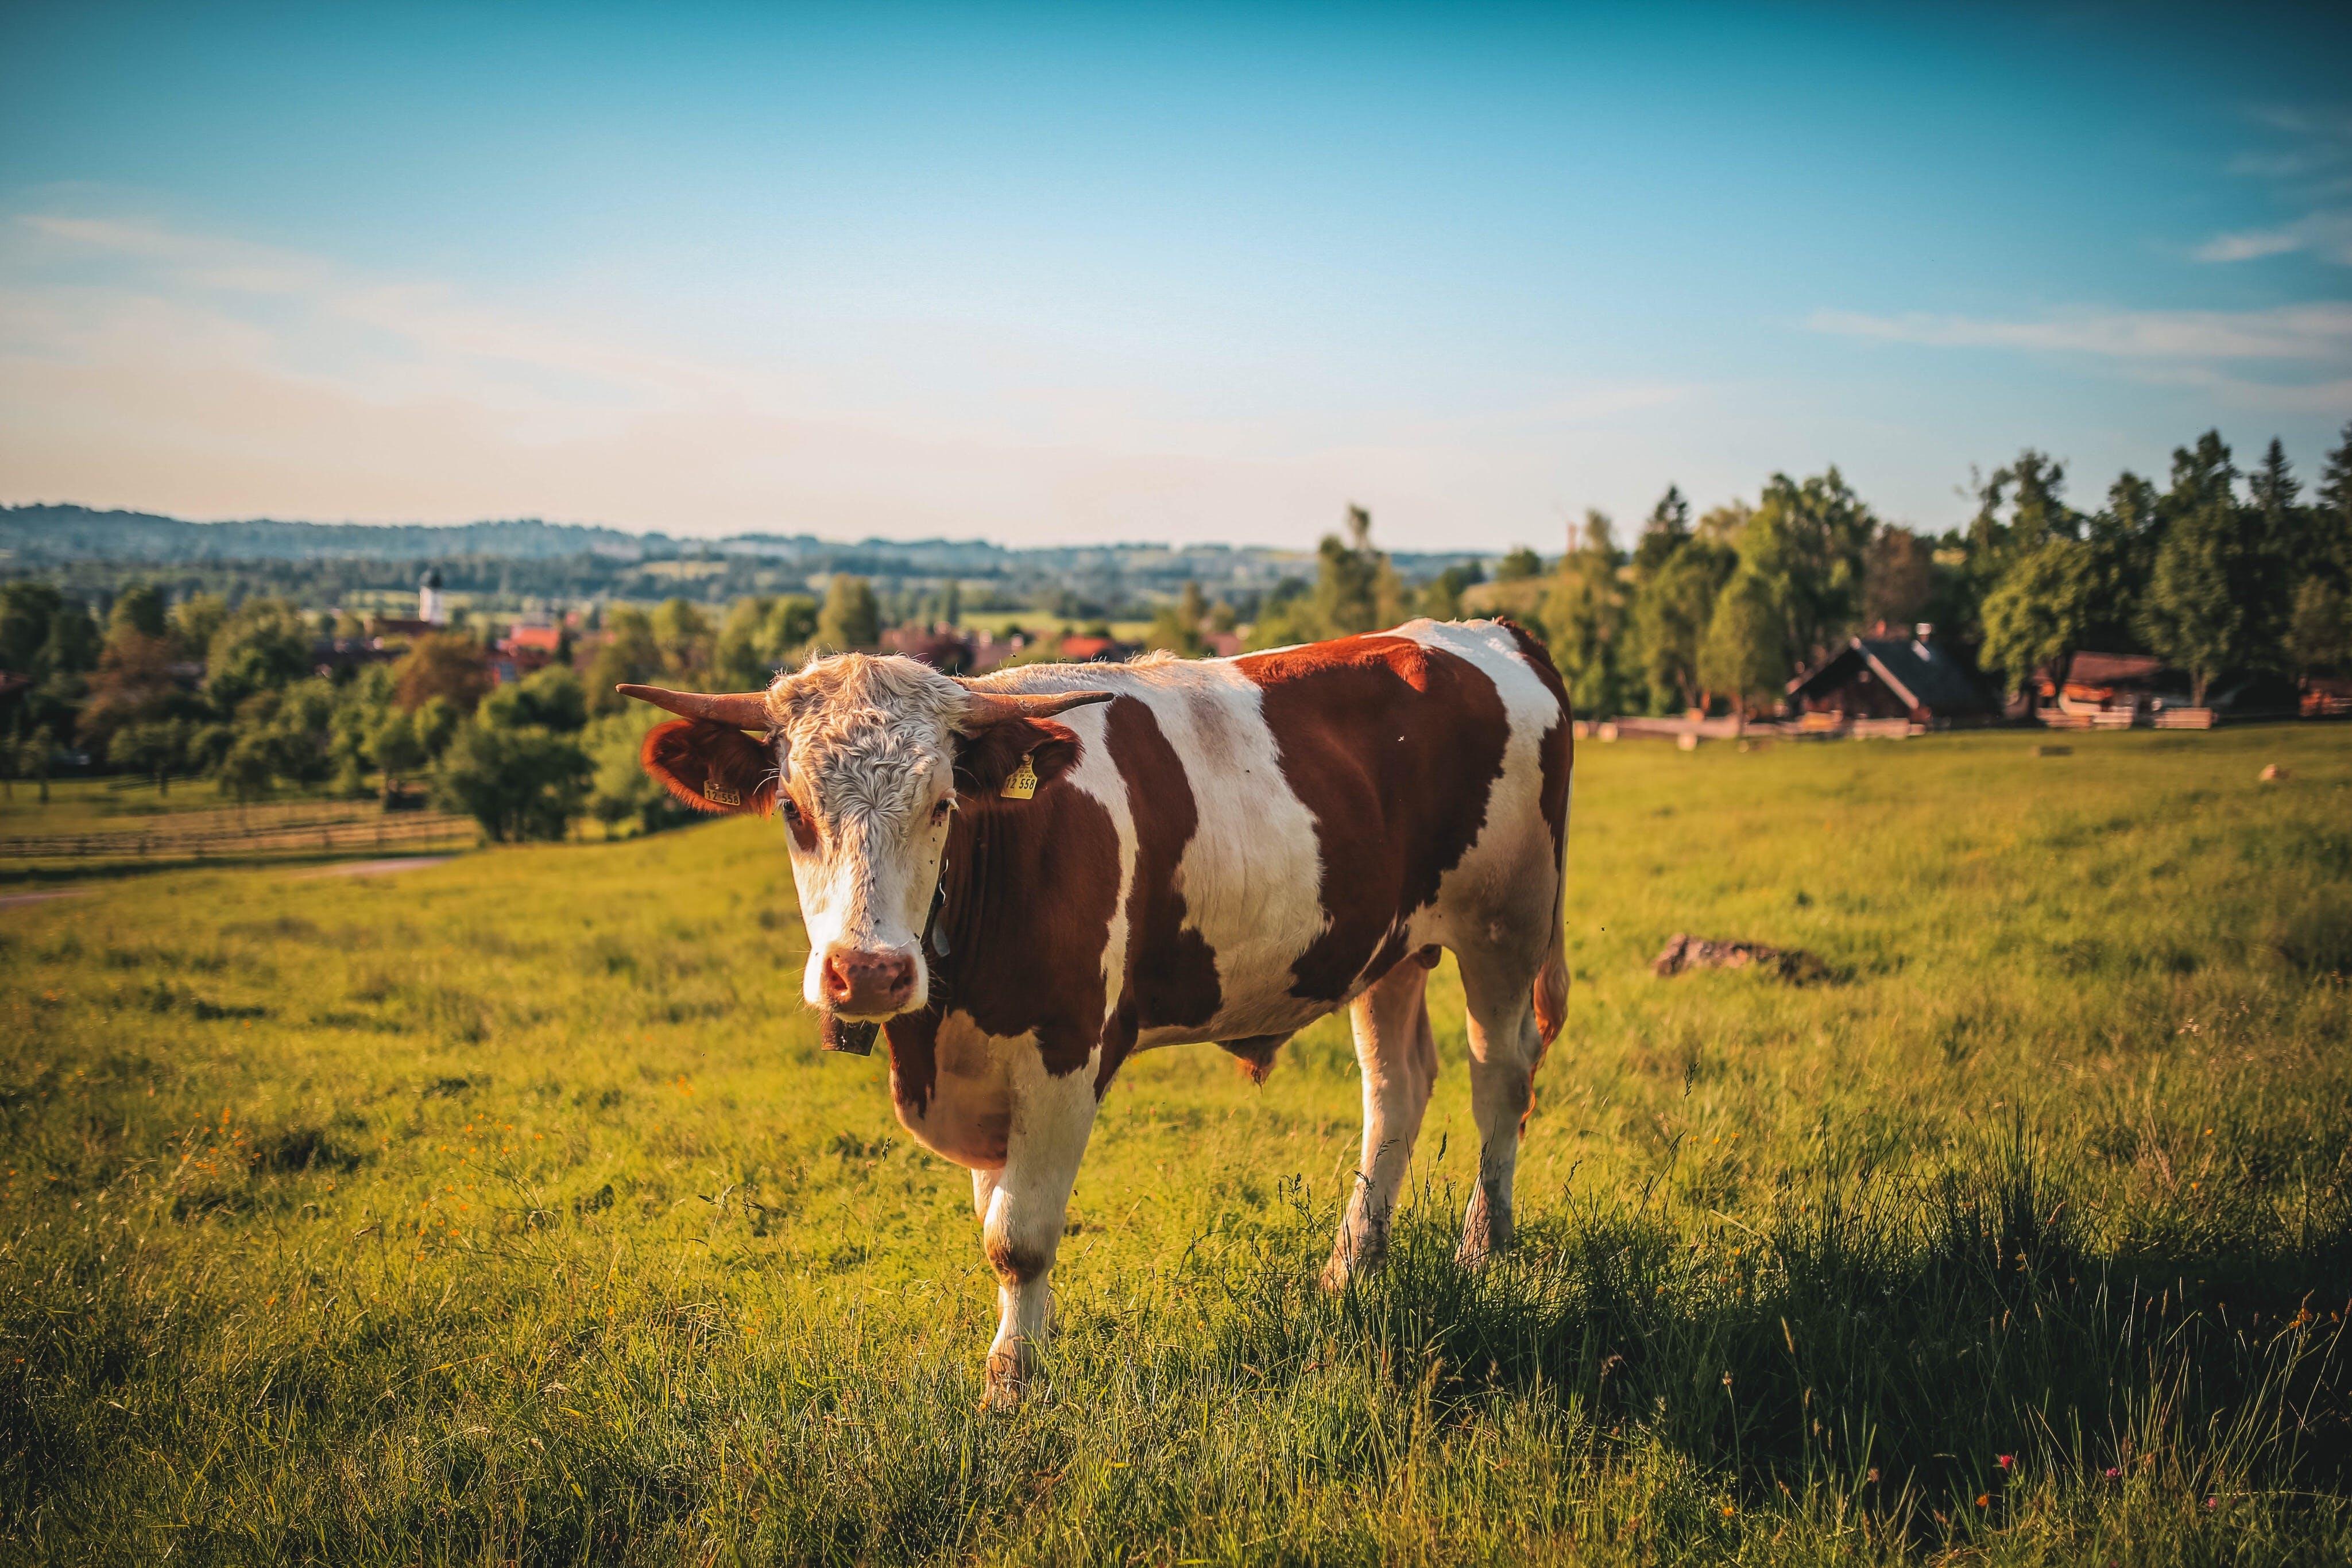 agriculture, animal, bull